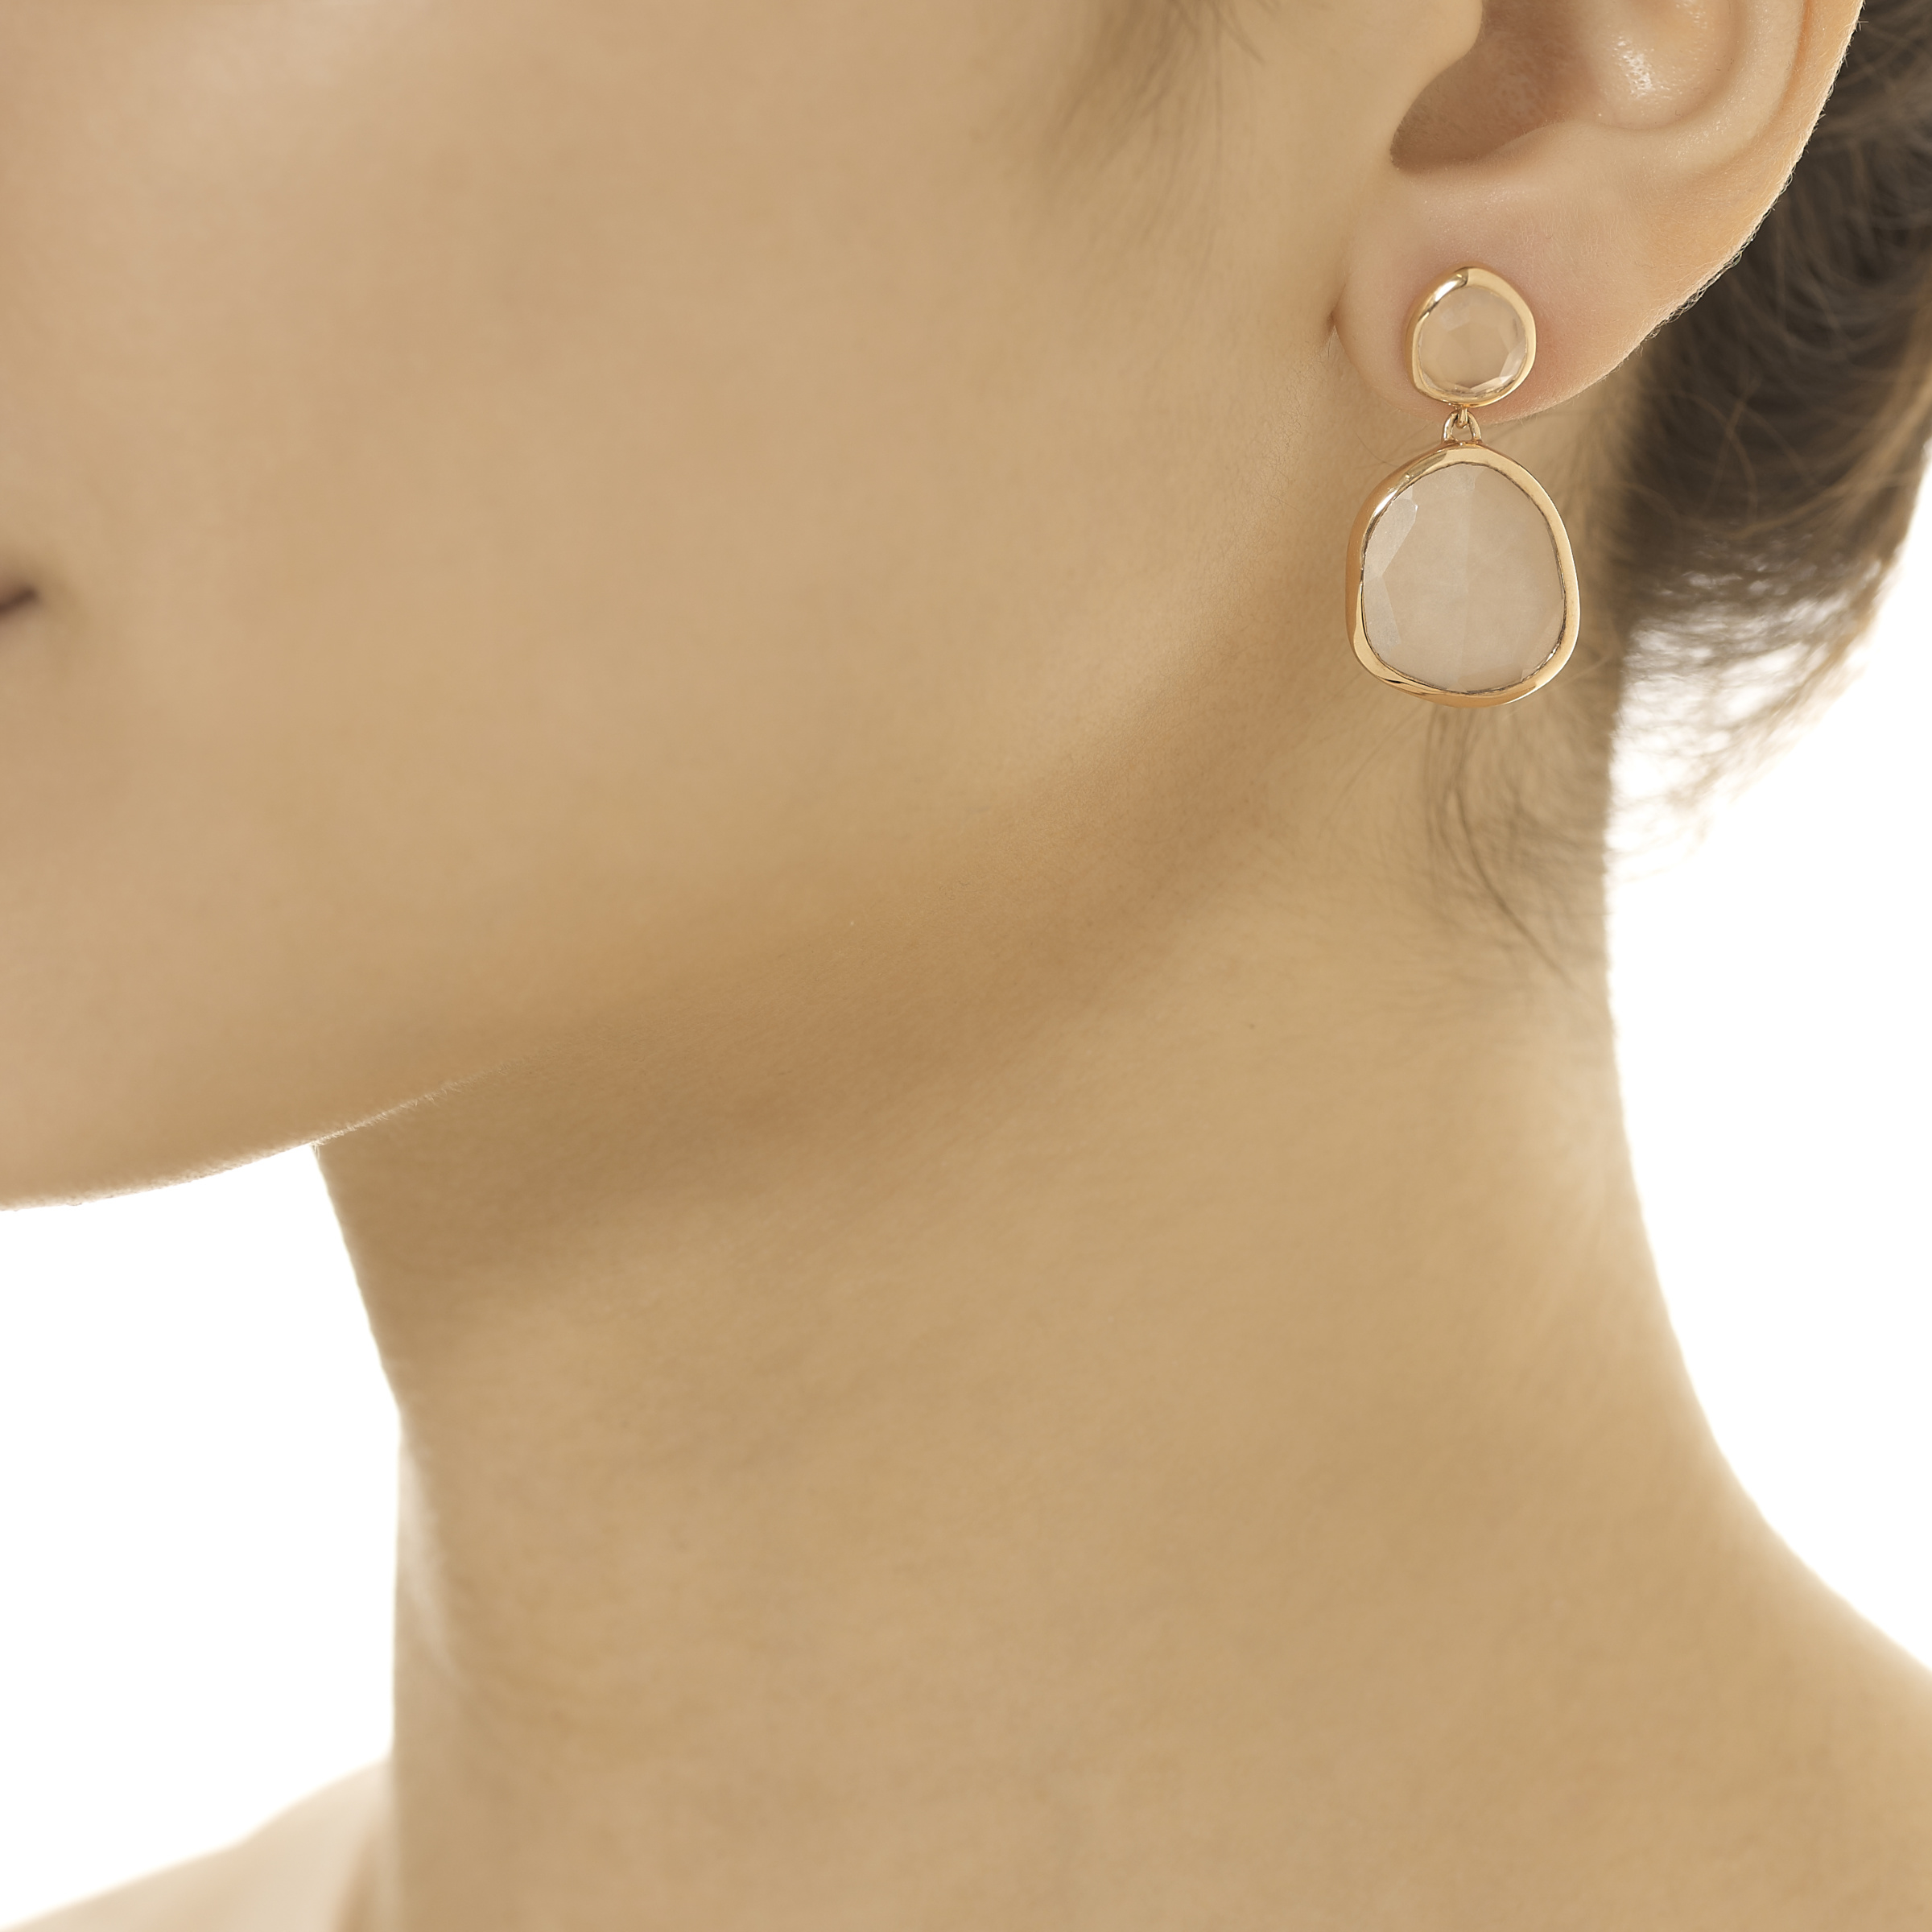 Rose Gold Siren Large Nugget Earrings Pink Quartz Monica Vinader UPC7sU